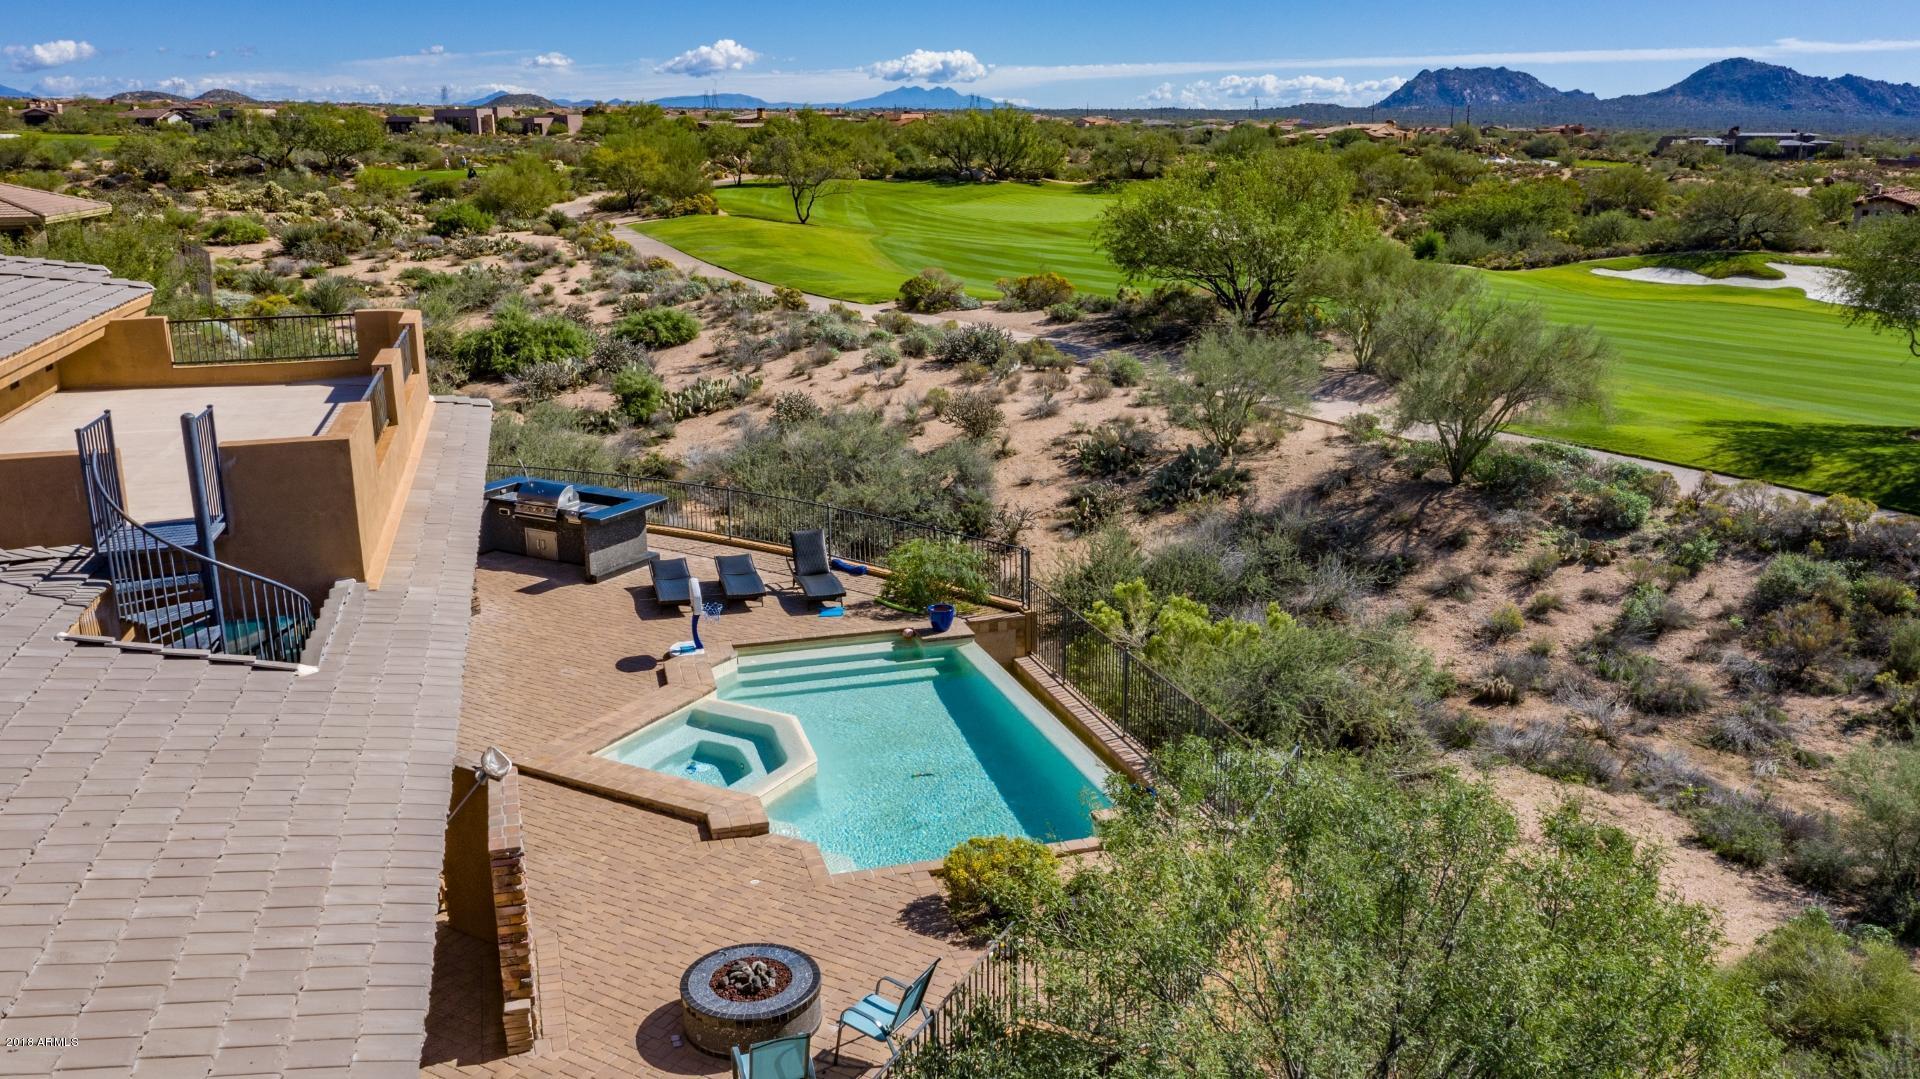 MLS 5841891 36791 N 102ND Place, Scottsdale, AZ Scottsdale AZ Mirabel Golf